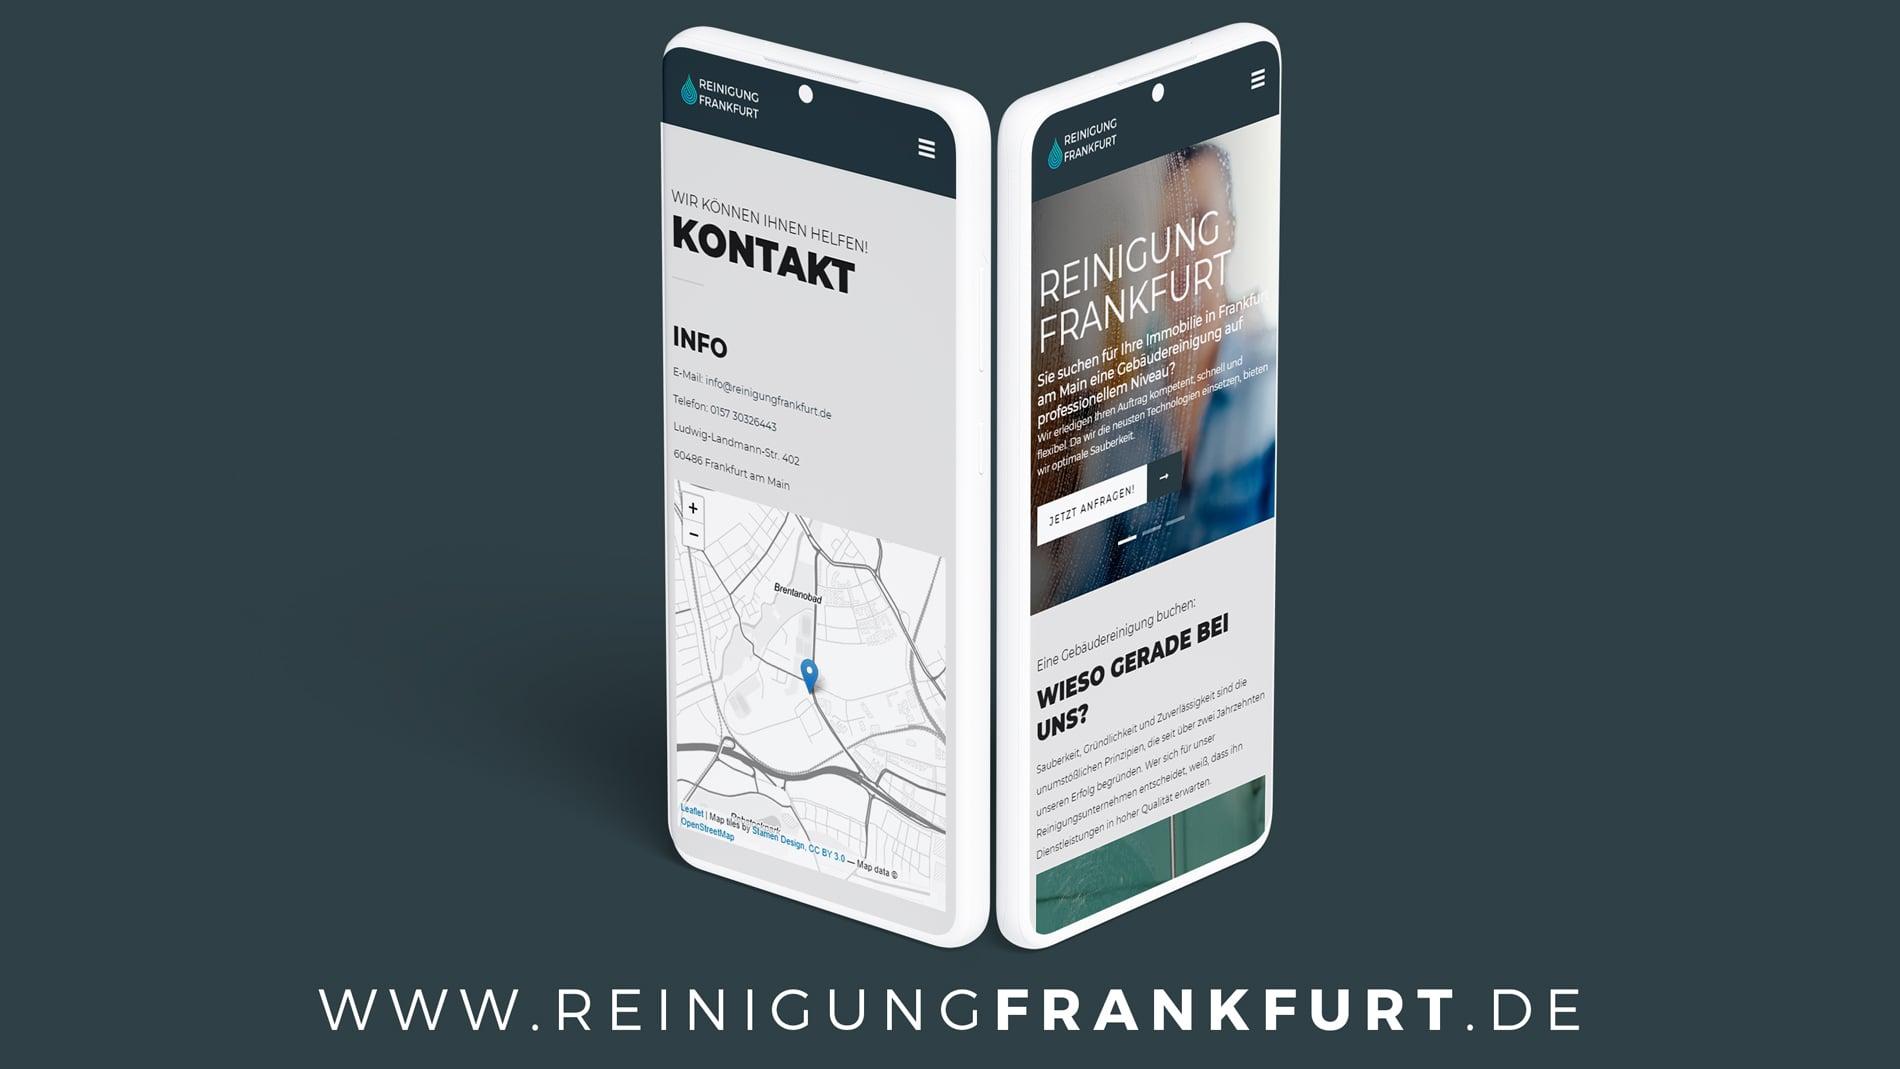 mockup-reinigungfrankfurt_mobile-min